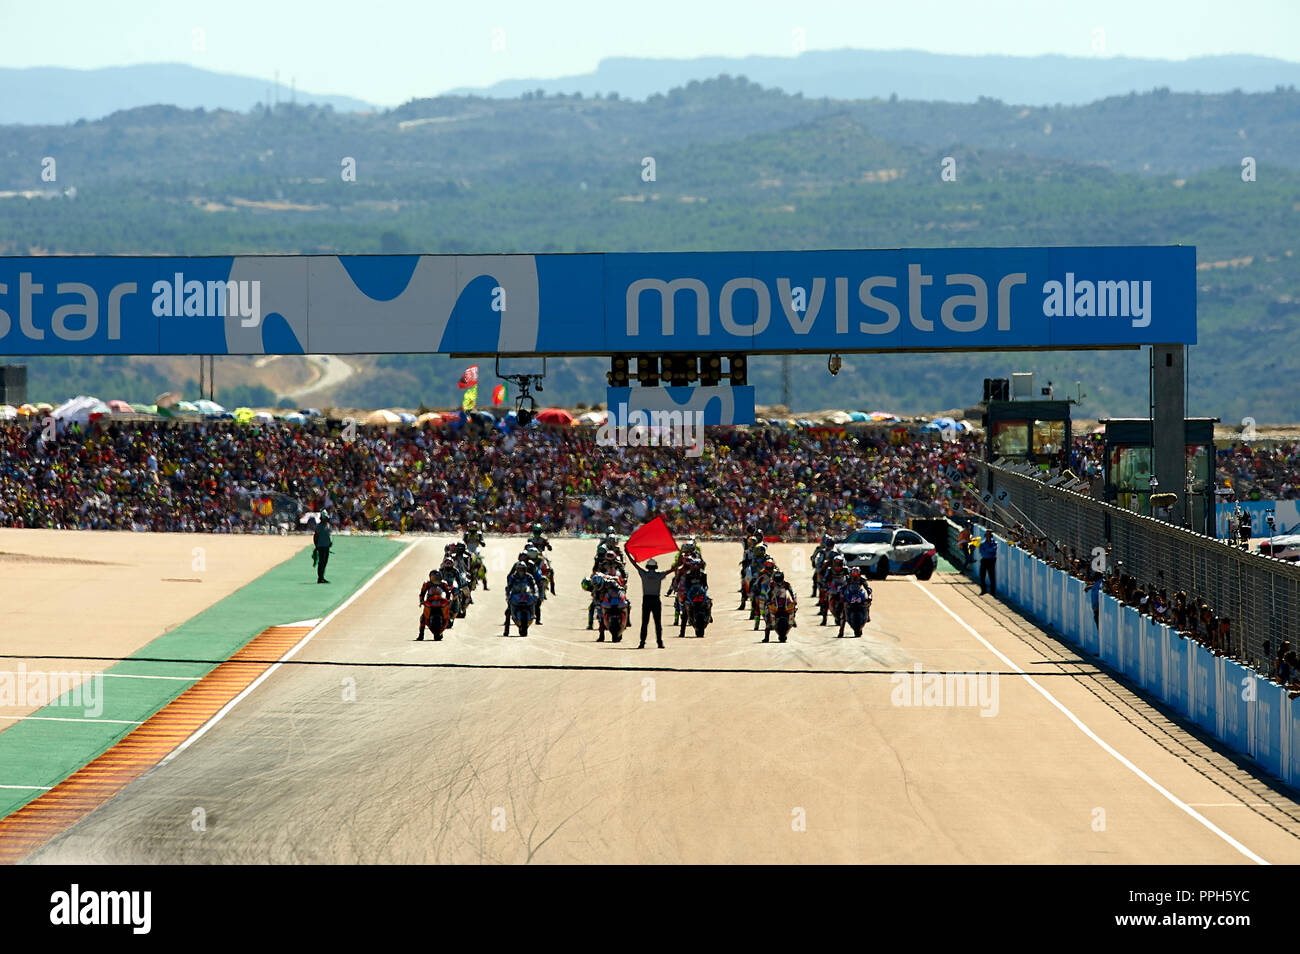 Start of the moto2 race during race day of the Gran Premio Movistar de Aragon of world championship of MotoGP at Motorland Aragon Circuit on September 23, 2018 in Alcaniz, Spain. - Stock Image